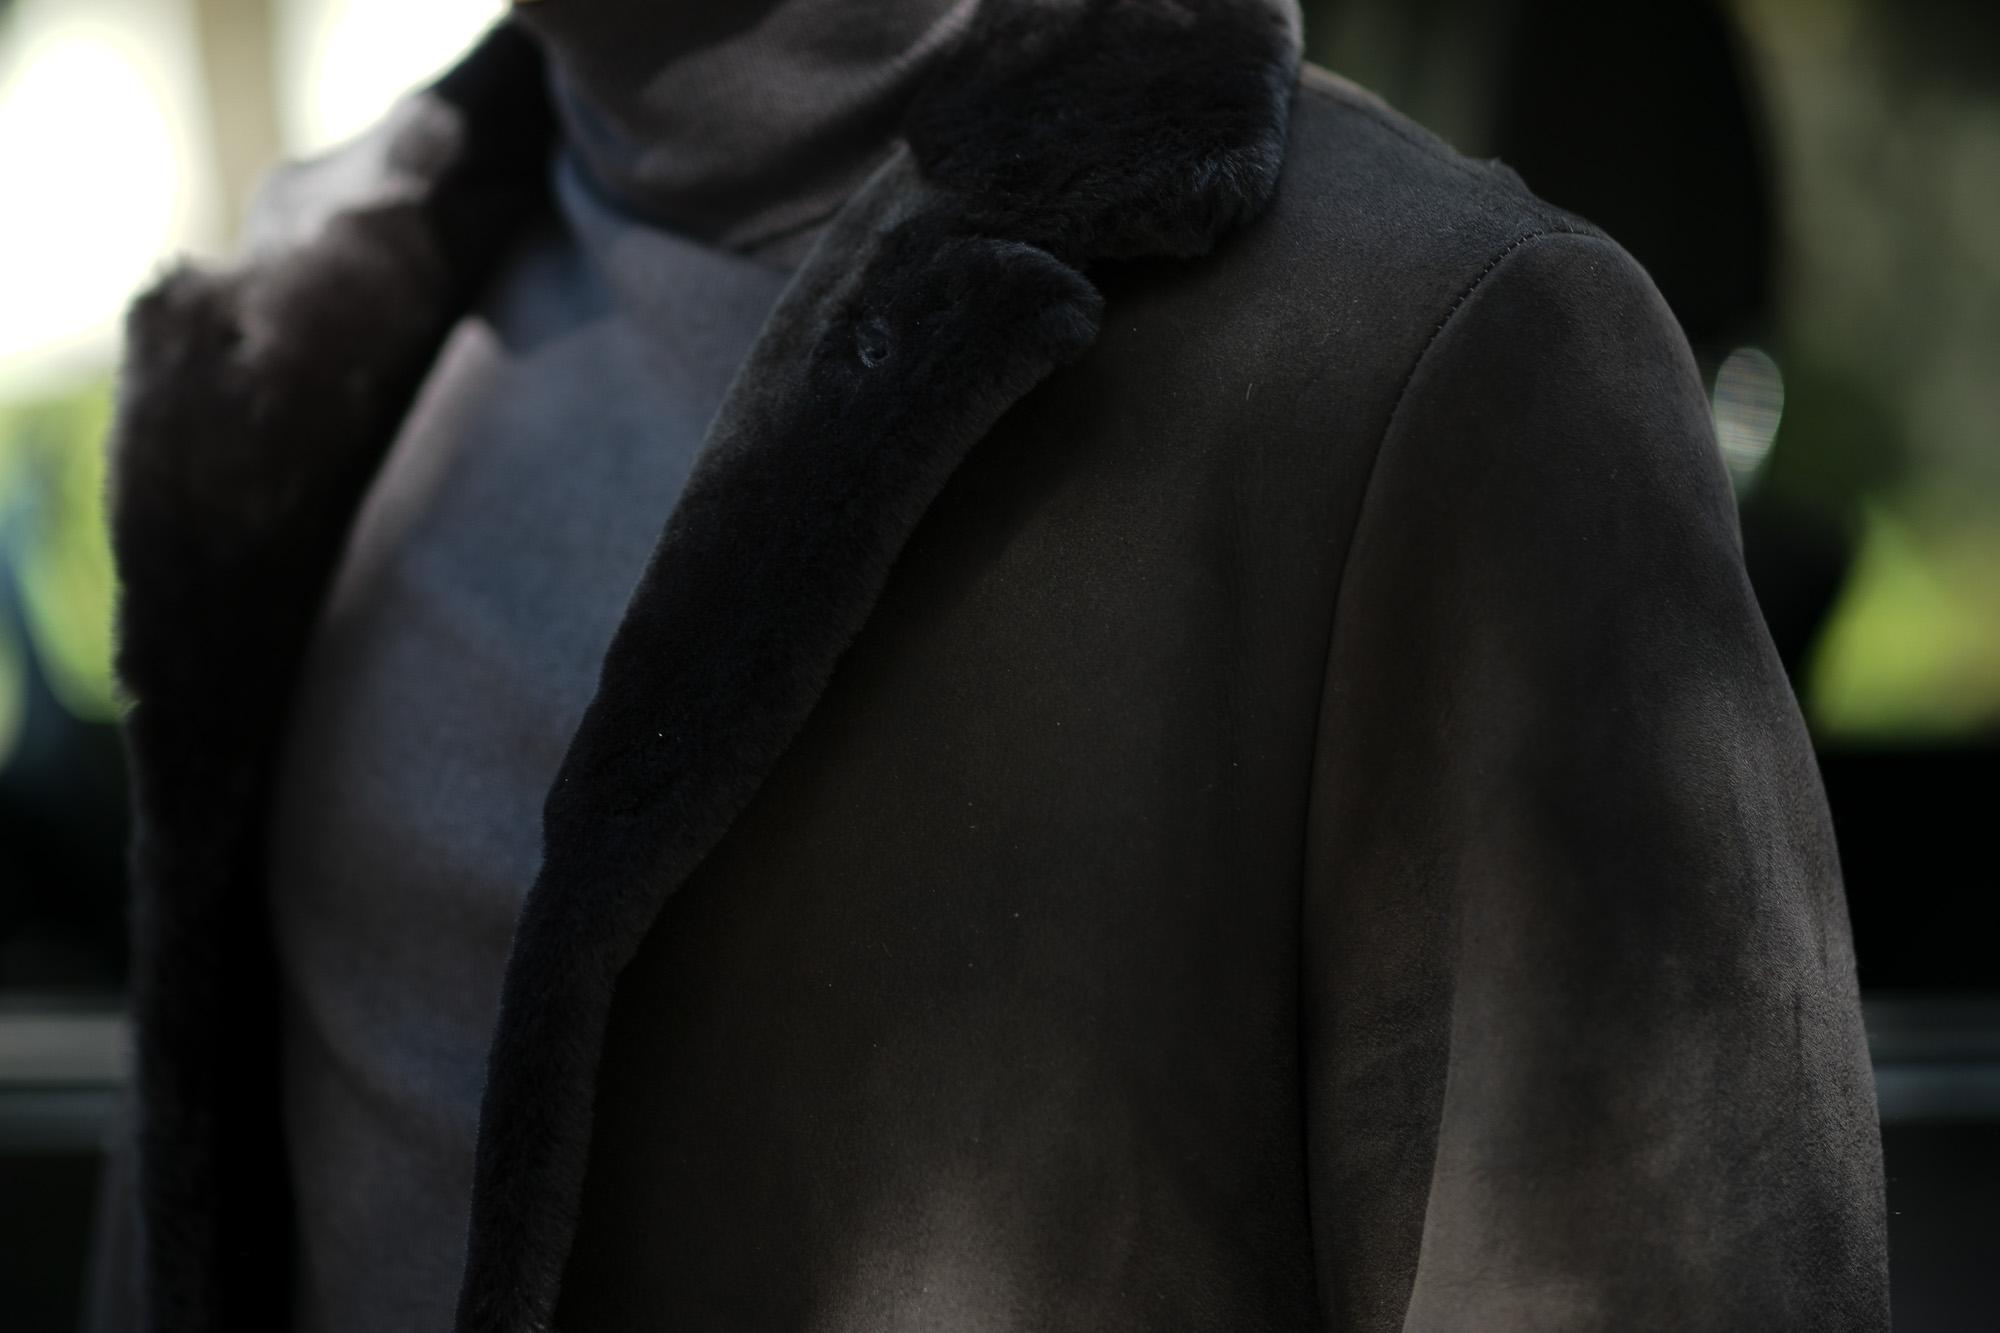 EMMETI (エンメティ) NAT (ナット) Merino Mouton (メリノ ムートン) シングル ムートンコート NERO (ブラック) Made in italy (イタリア製) 2019 秋冬 【ご予約受付中】 愛知 名古屋 alto e diritto アルトエデリット altoediritto 干場さん 干場着 ユーリ